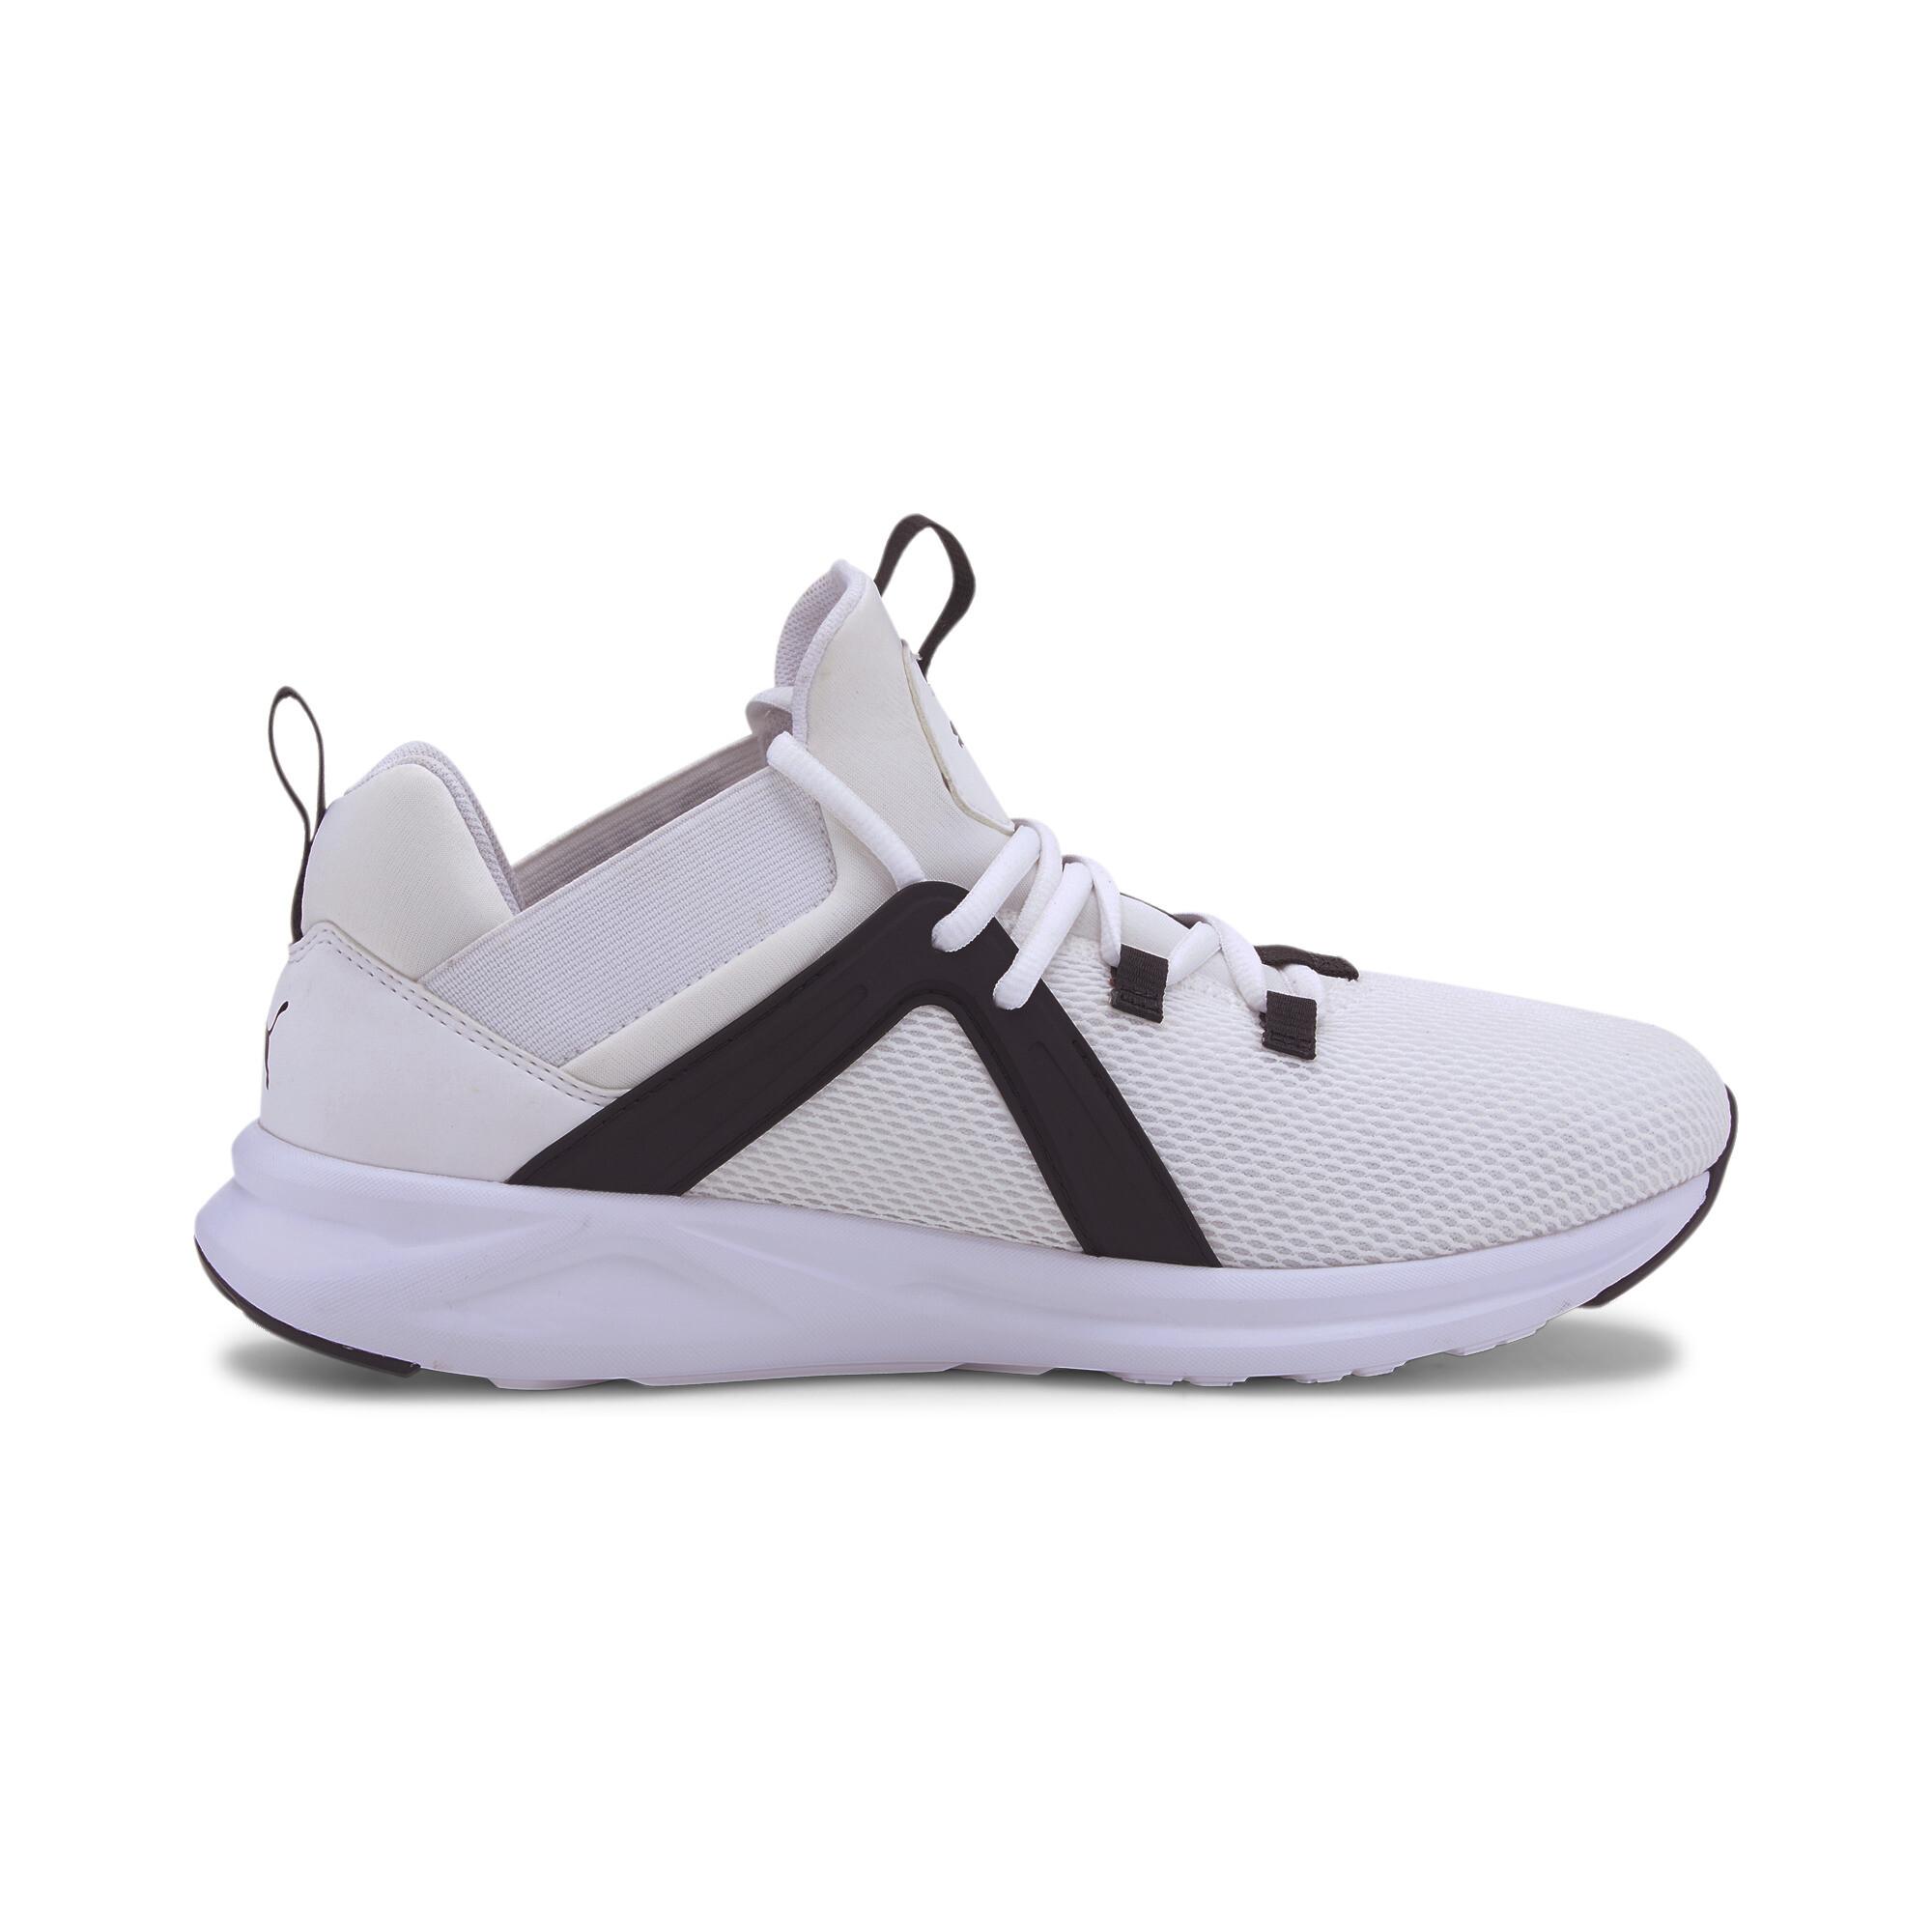 PUMA-Men-039-s-Enzo-2-Training-Shoes thumbnail 40